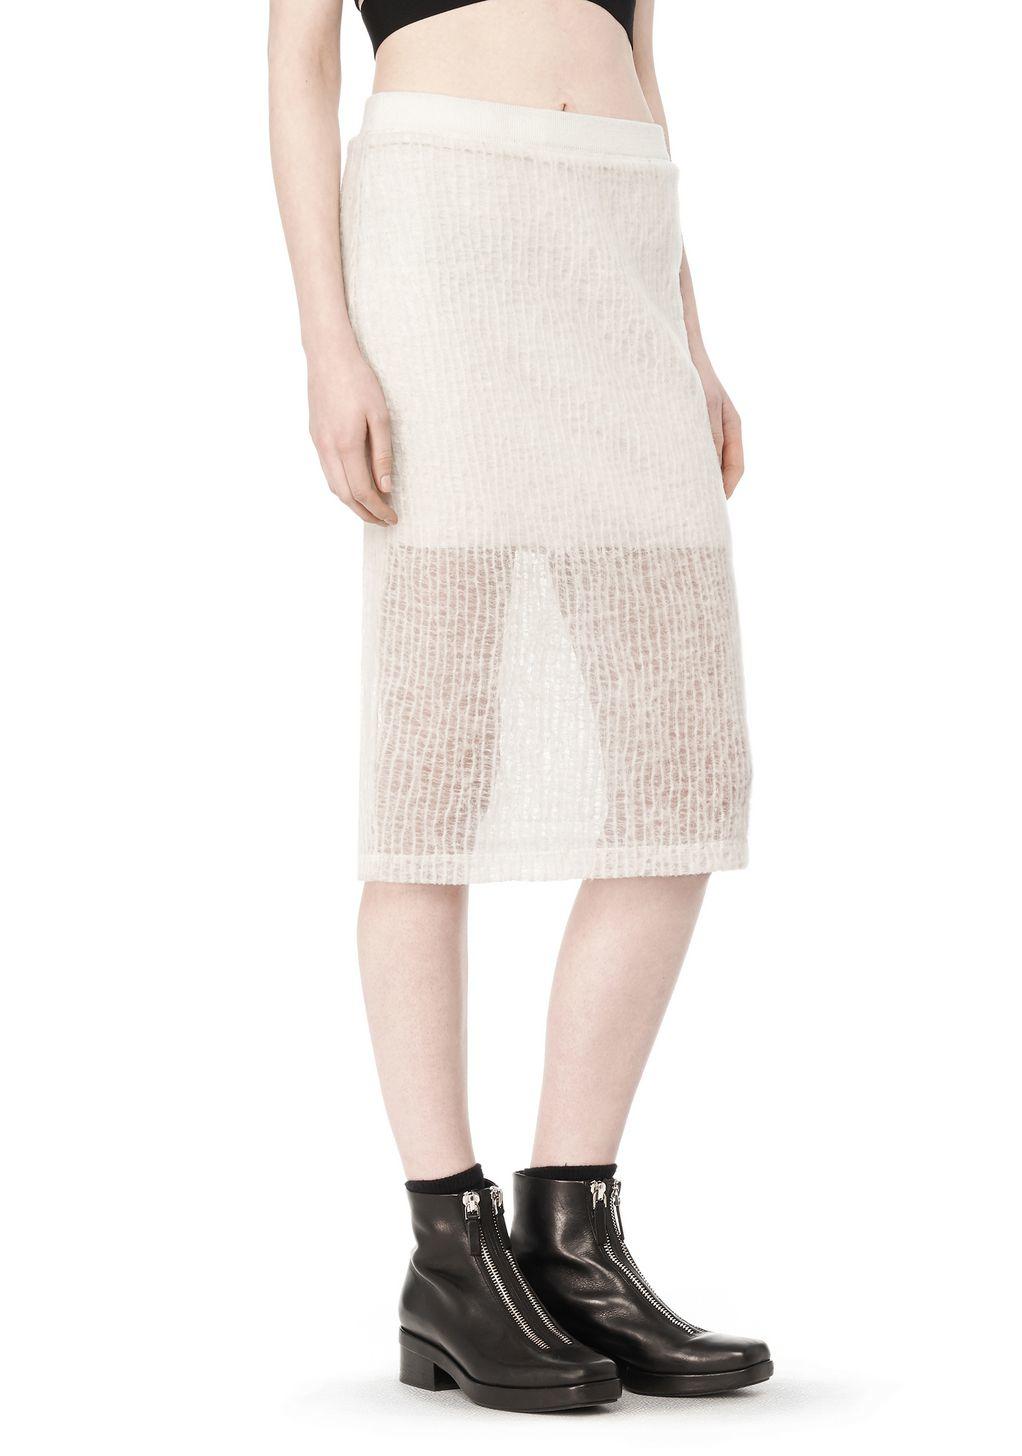 Tailbone, medical 2 Layer skirt